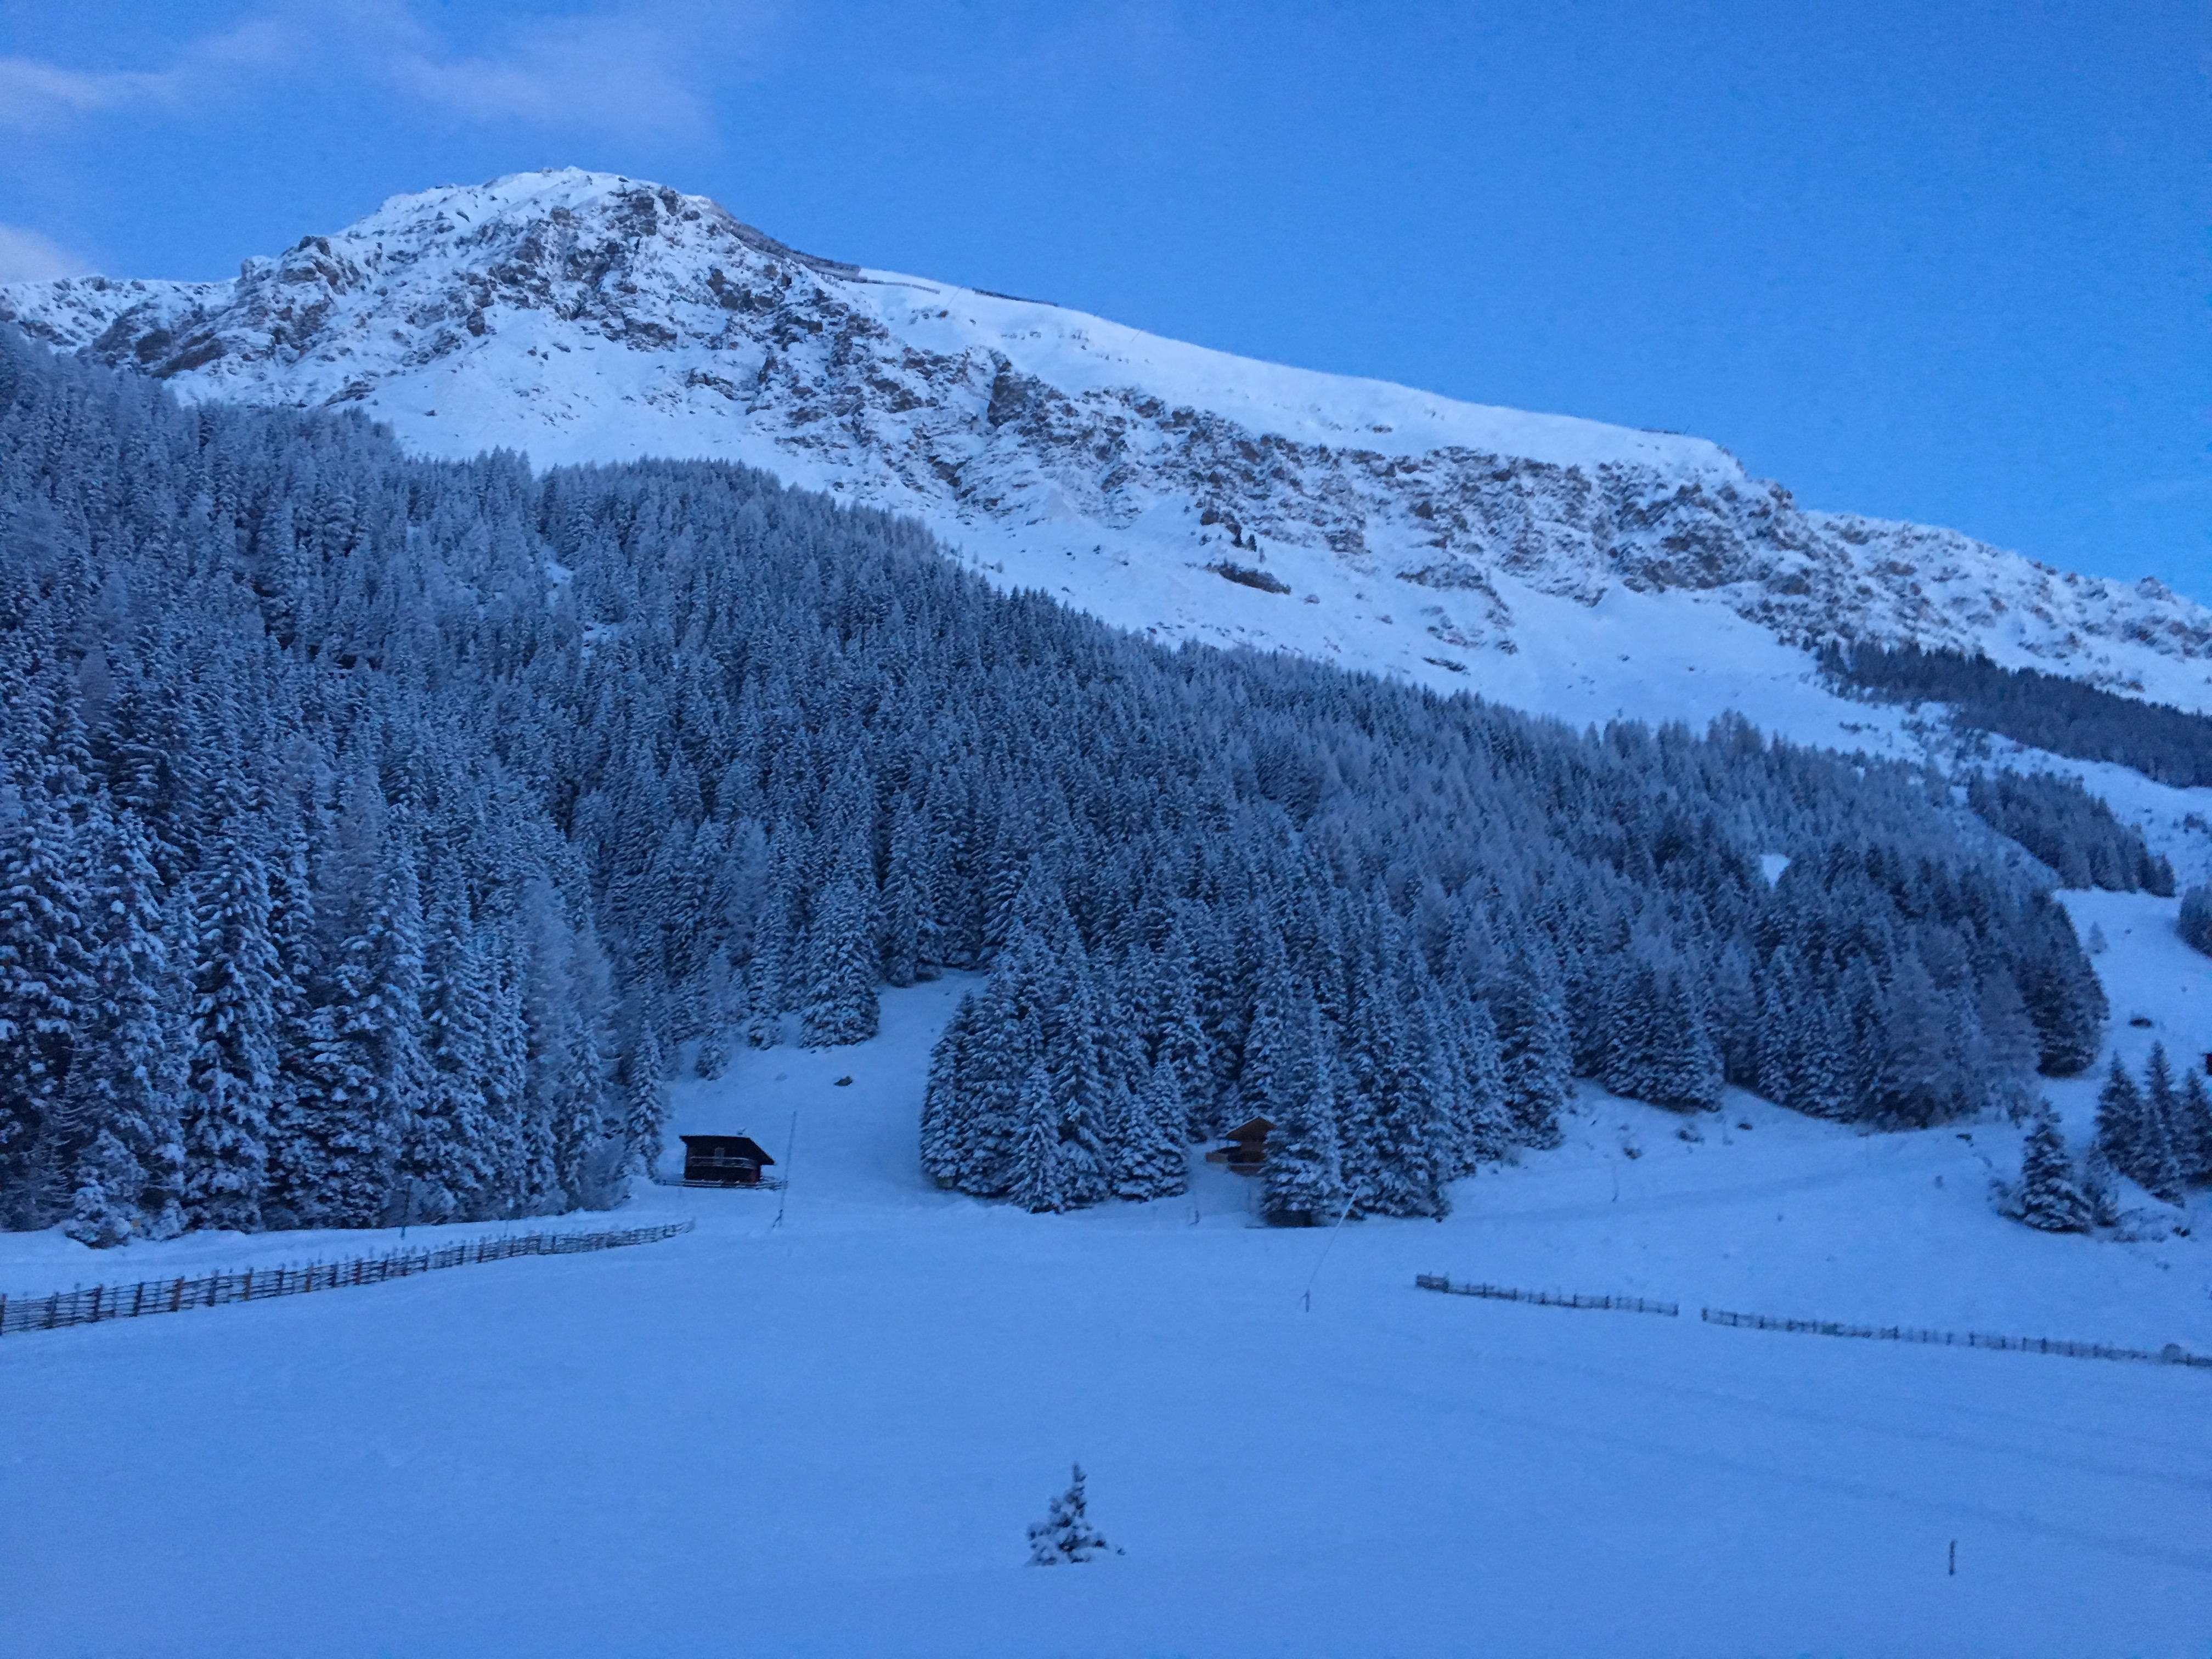 tux tux hintertux - 1 week in the most beautiful ski resort in